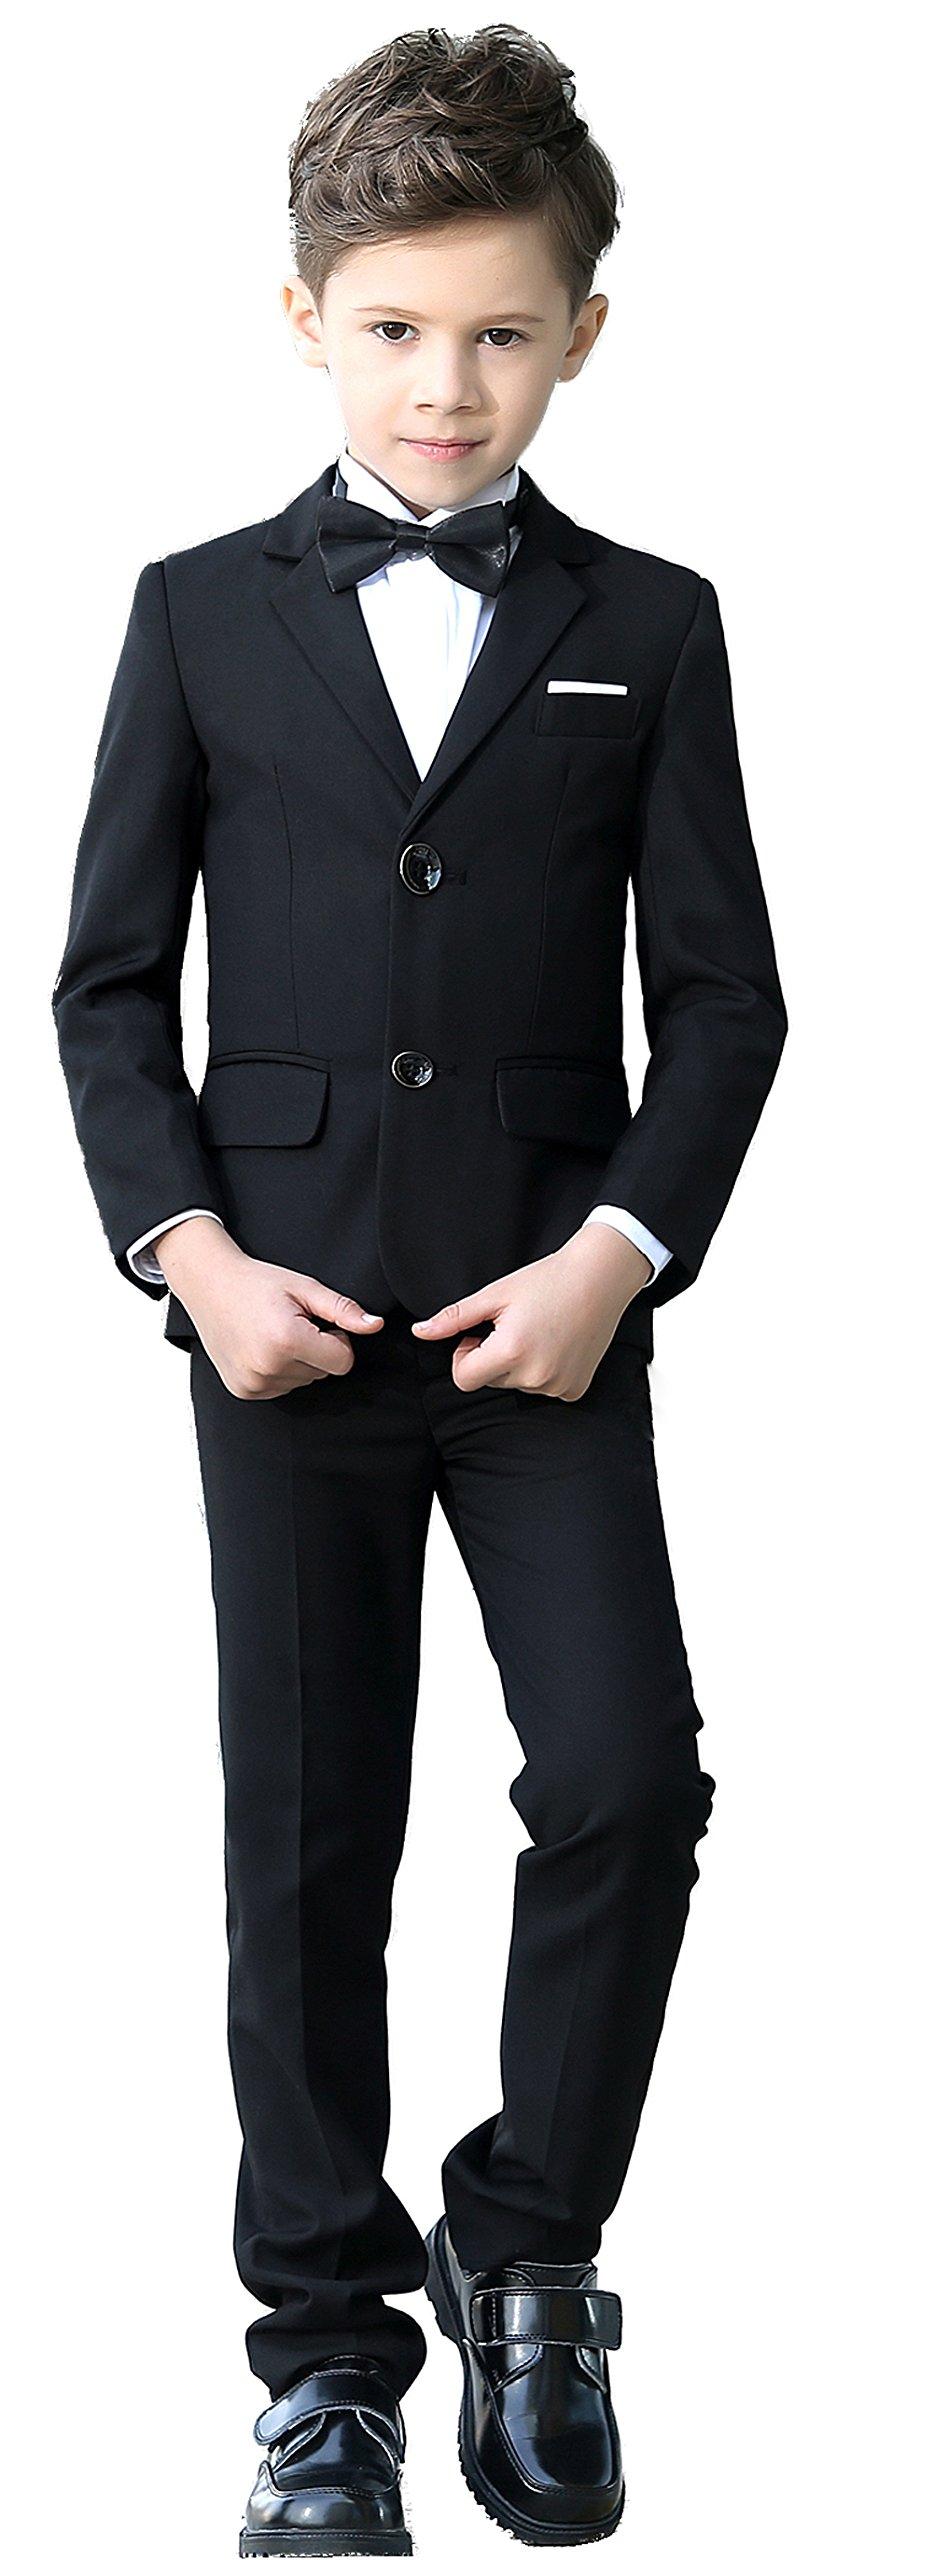 YuanLu Boys Colorful Formal Suits 5 Piece Slim Fit Dresswear Suit Set (Black, 14) by YuanLu (Image #1)